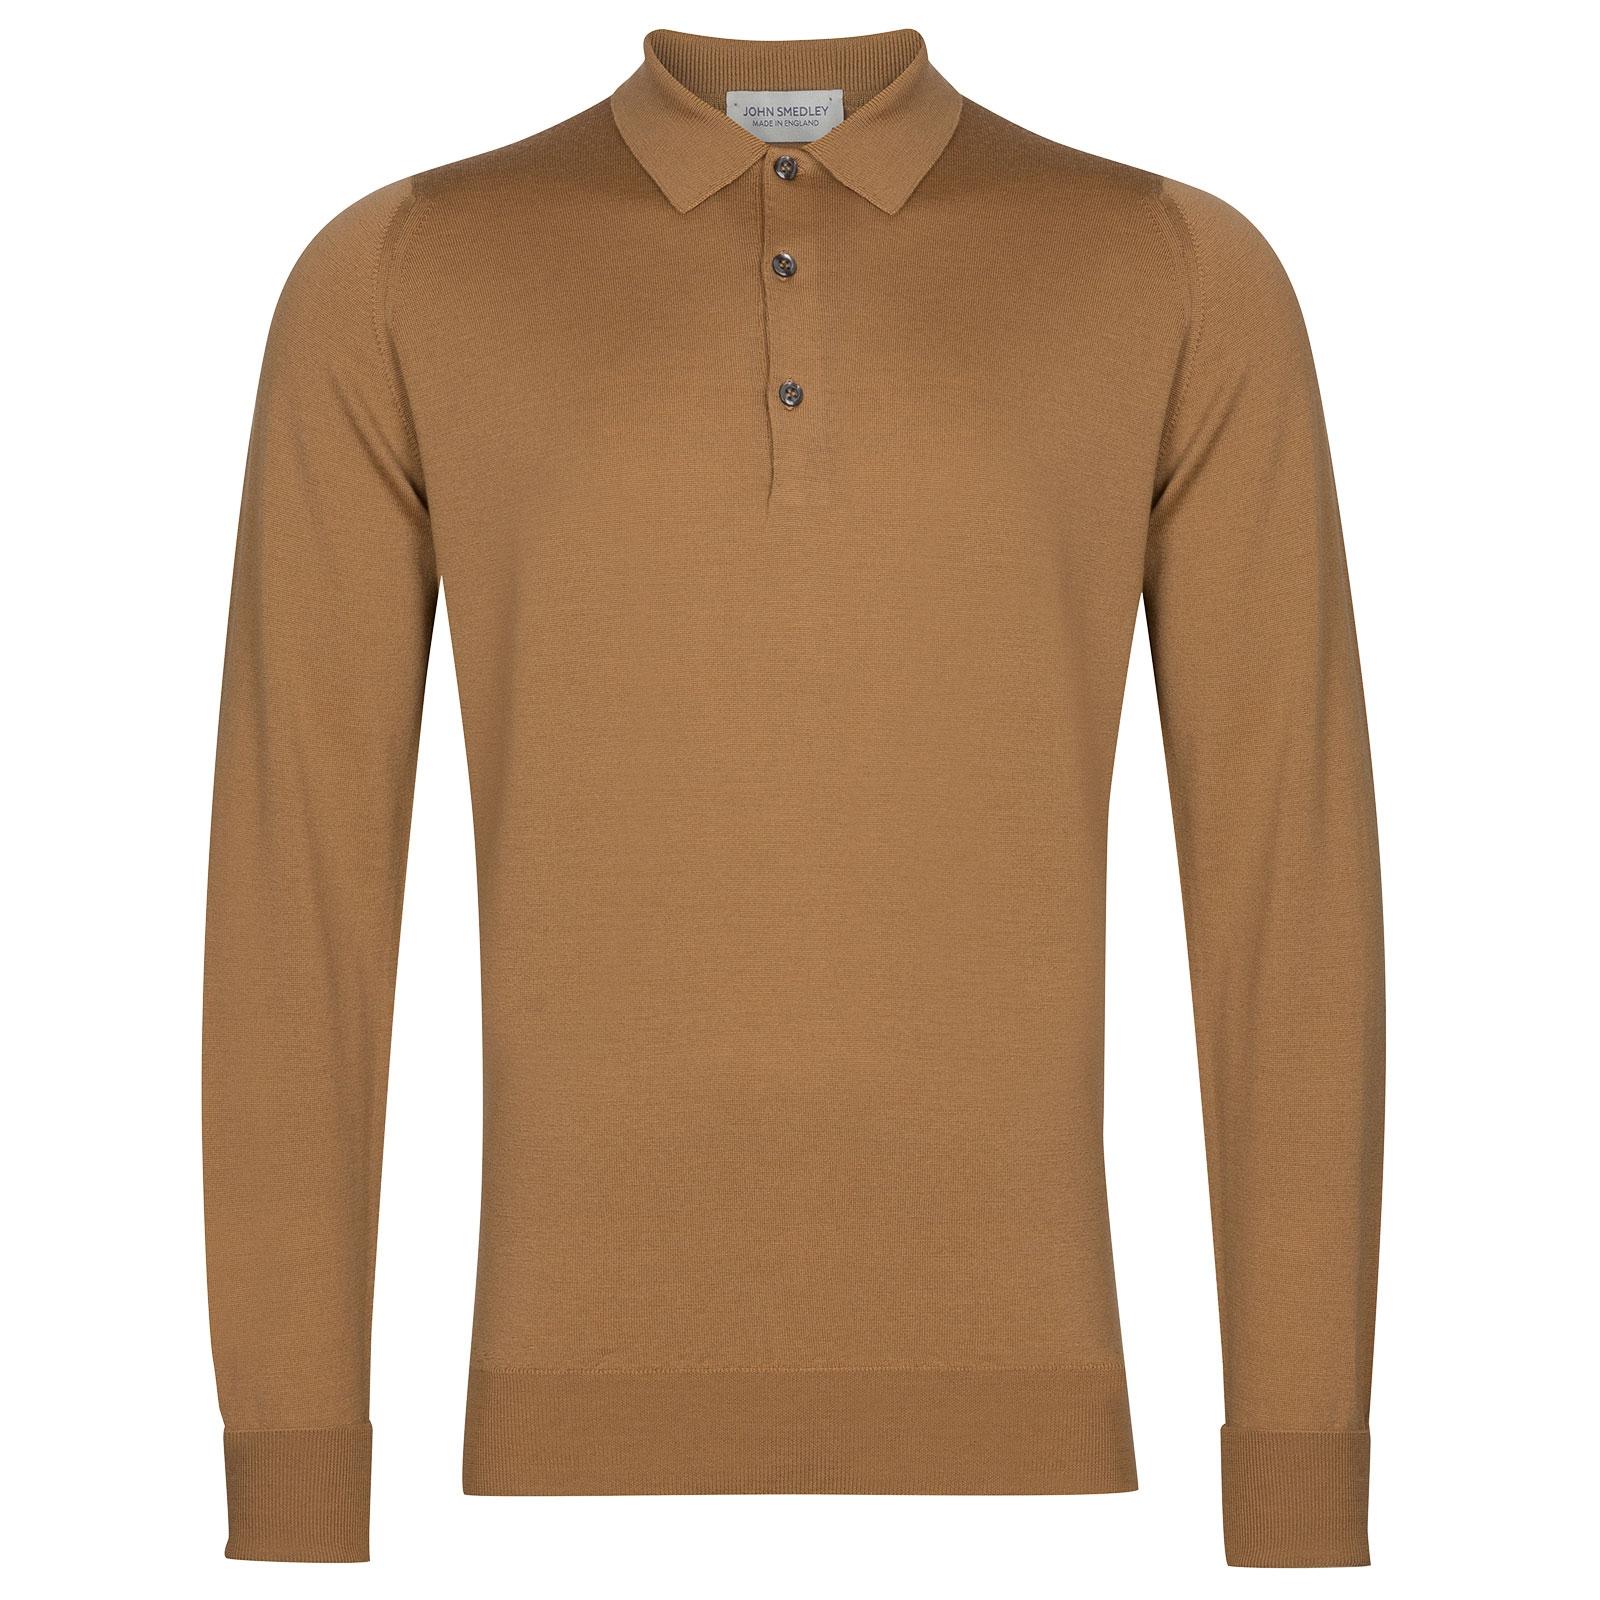 John Smedley Cotswold in Camel Shirt-xsm